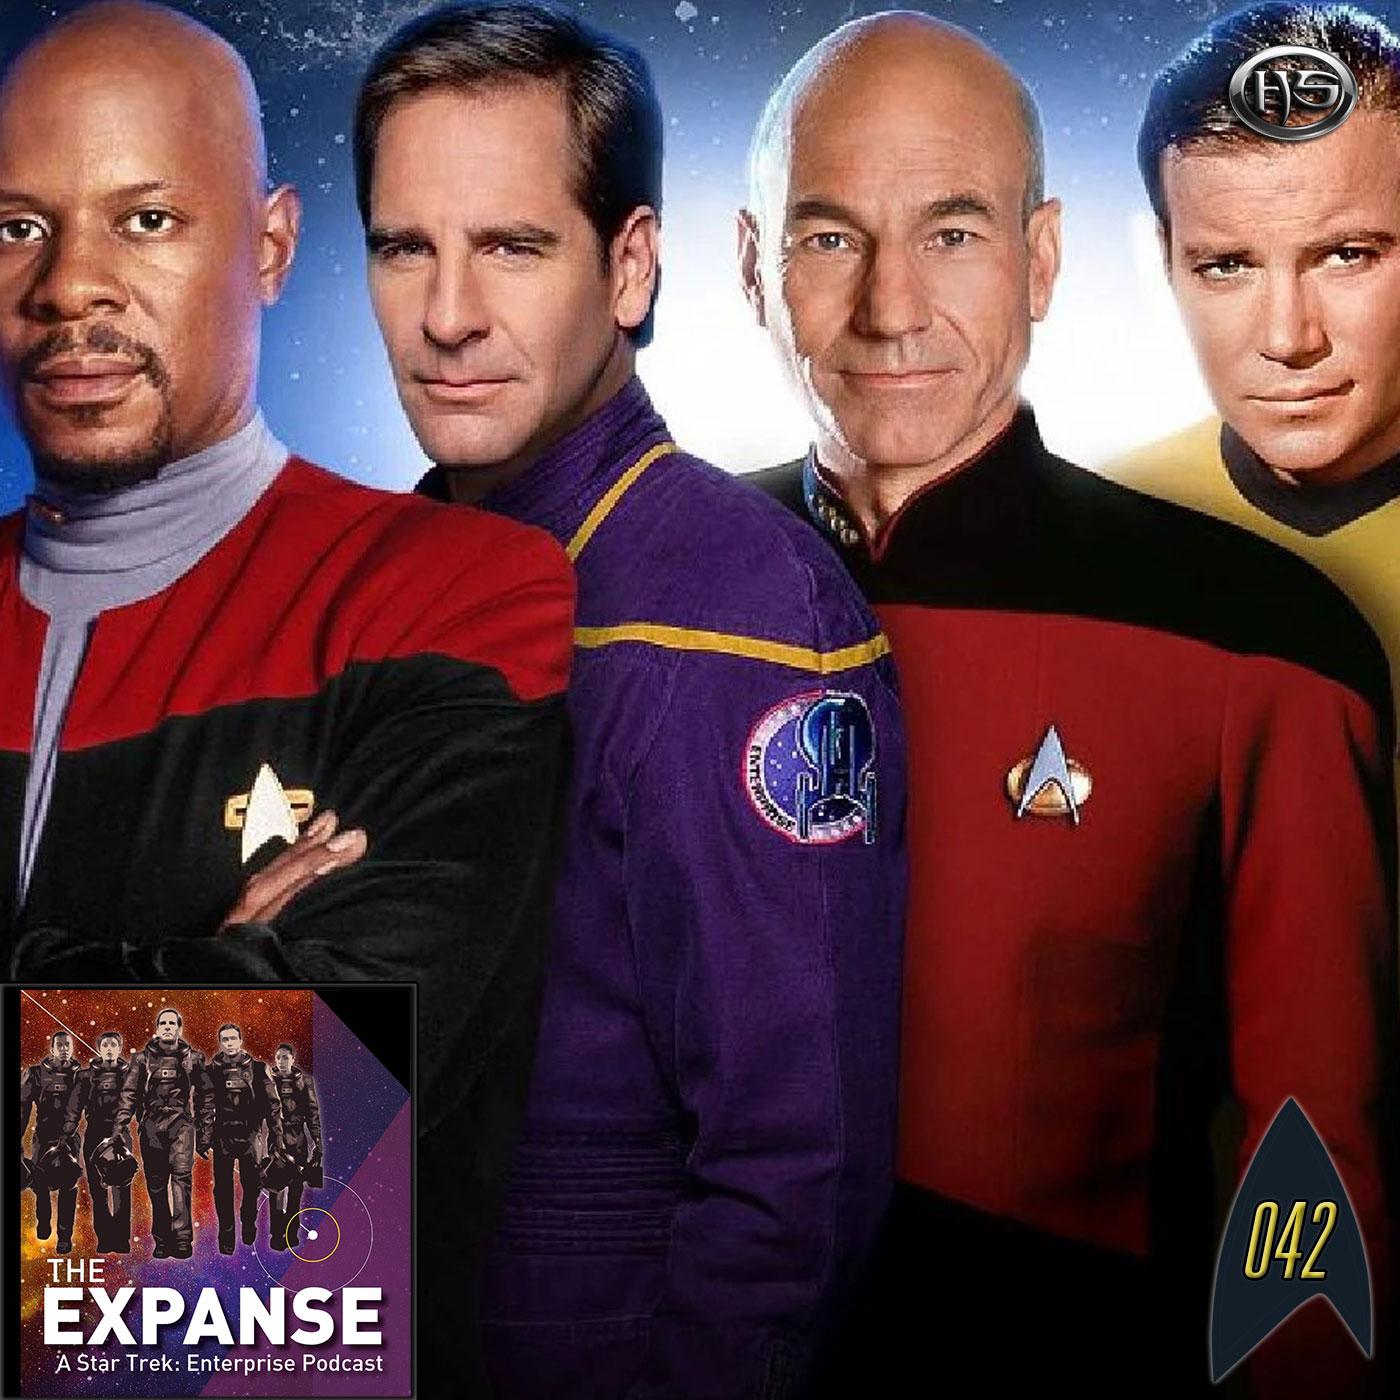 The Expanse Episode 42